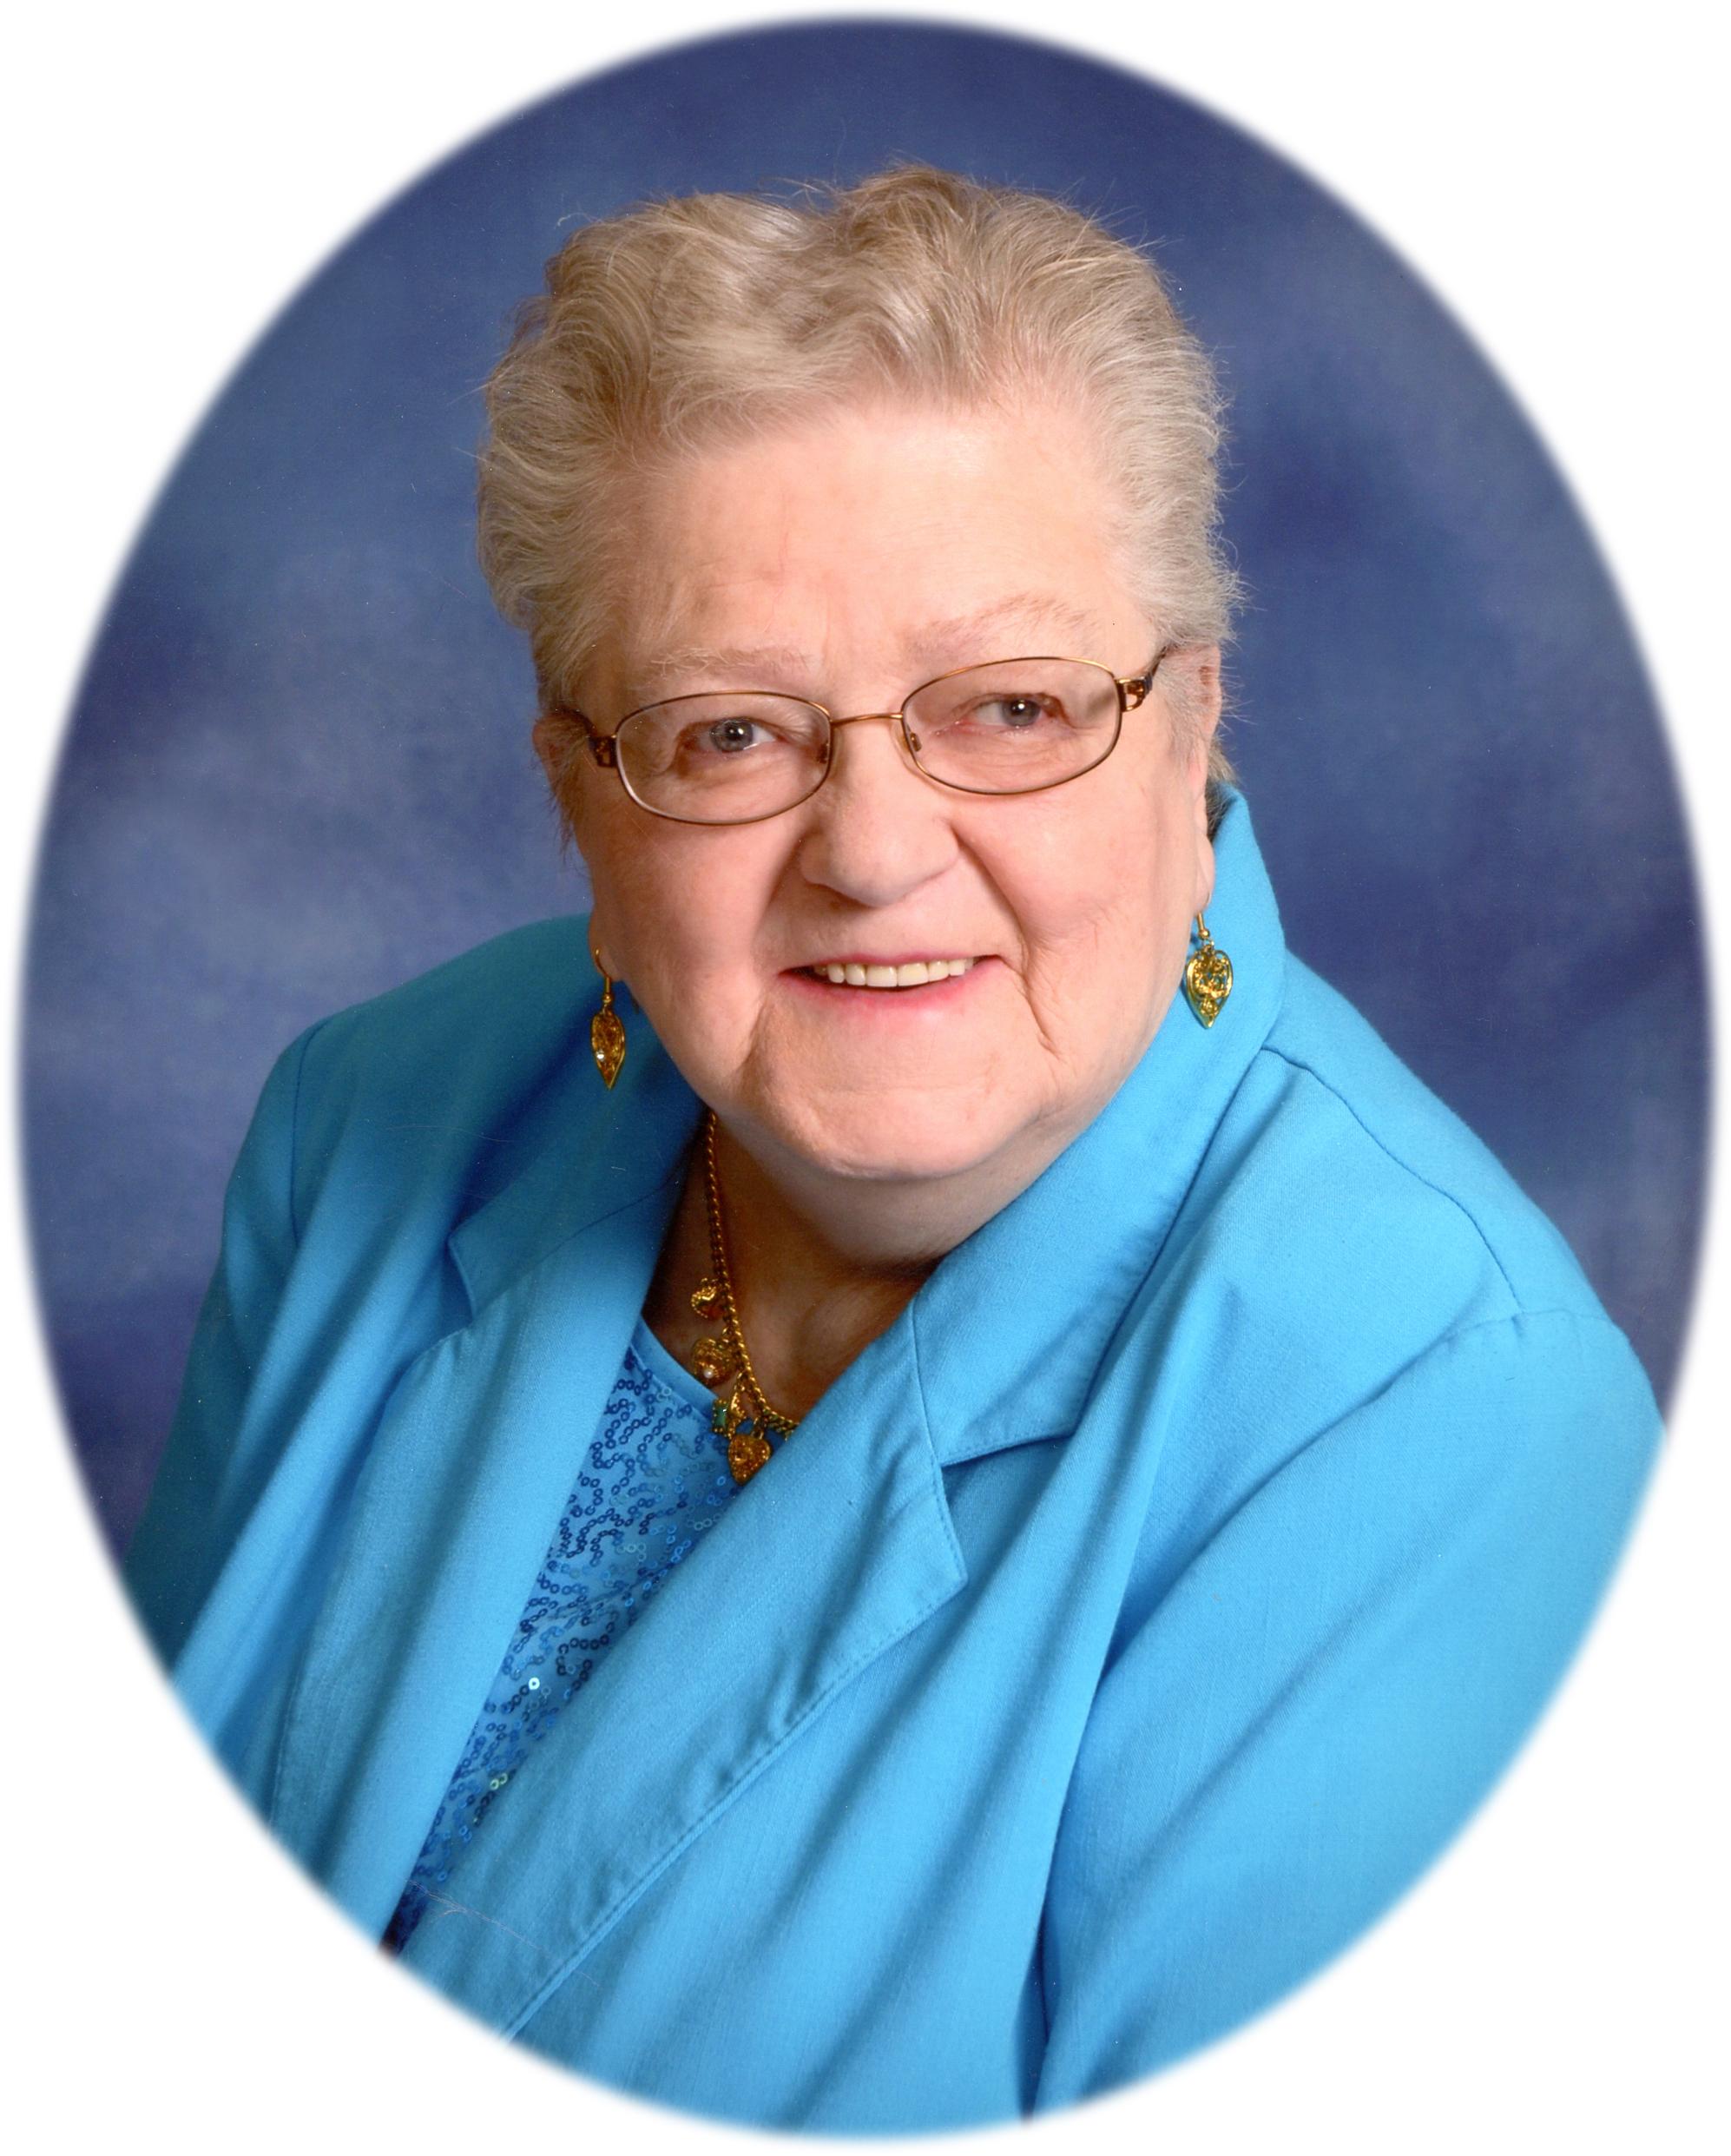 Phyllis W. Evans